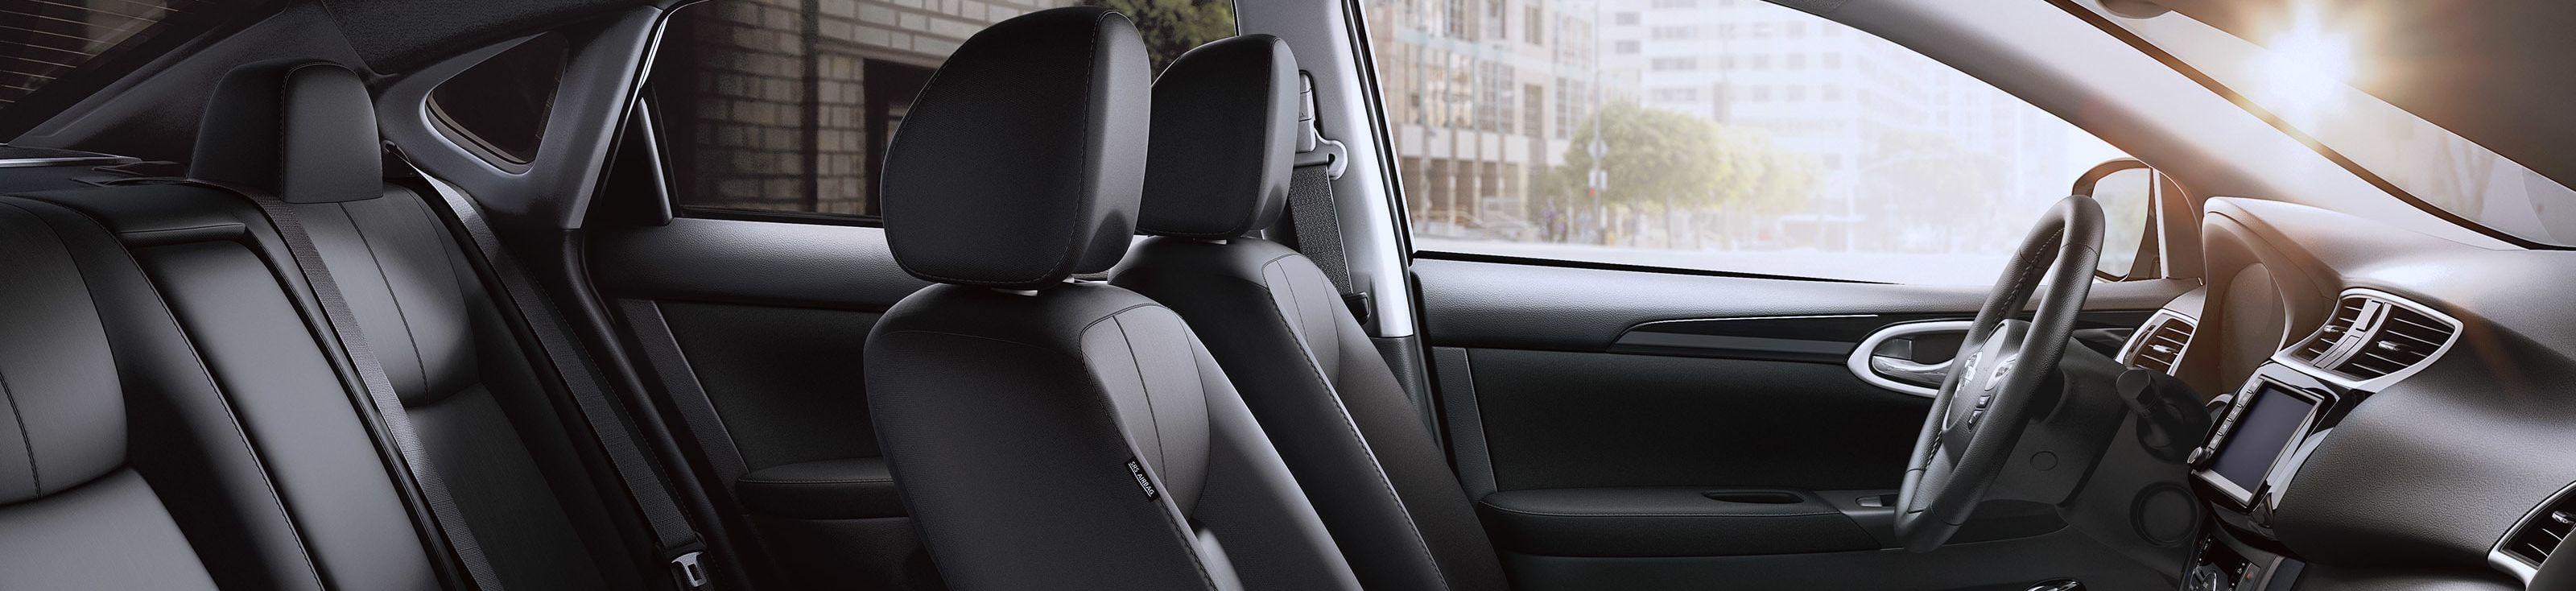 Excellent 2019 Nissan Sentra For Sale Near Davis Ca Nissan Of Elk Spiritservingveterans Wood Chair Design Ideas Spiritservingveteransorg